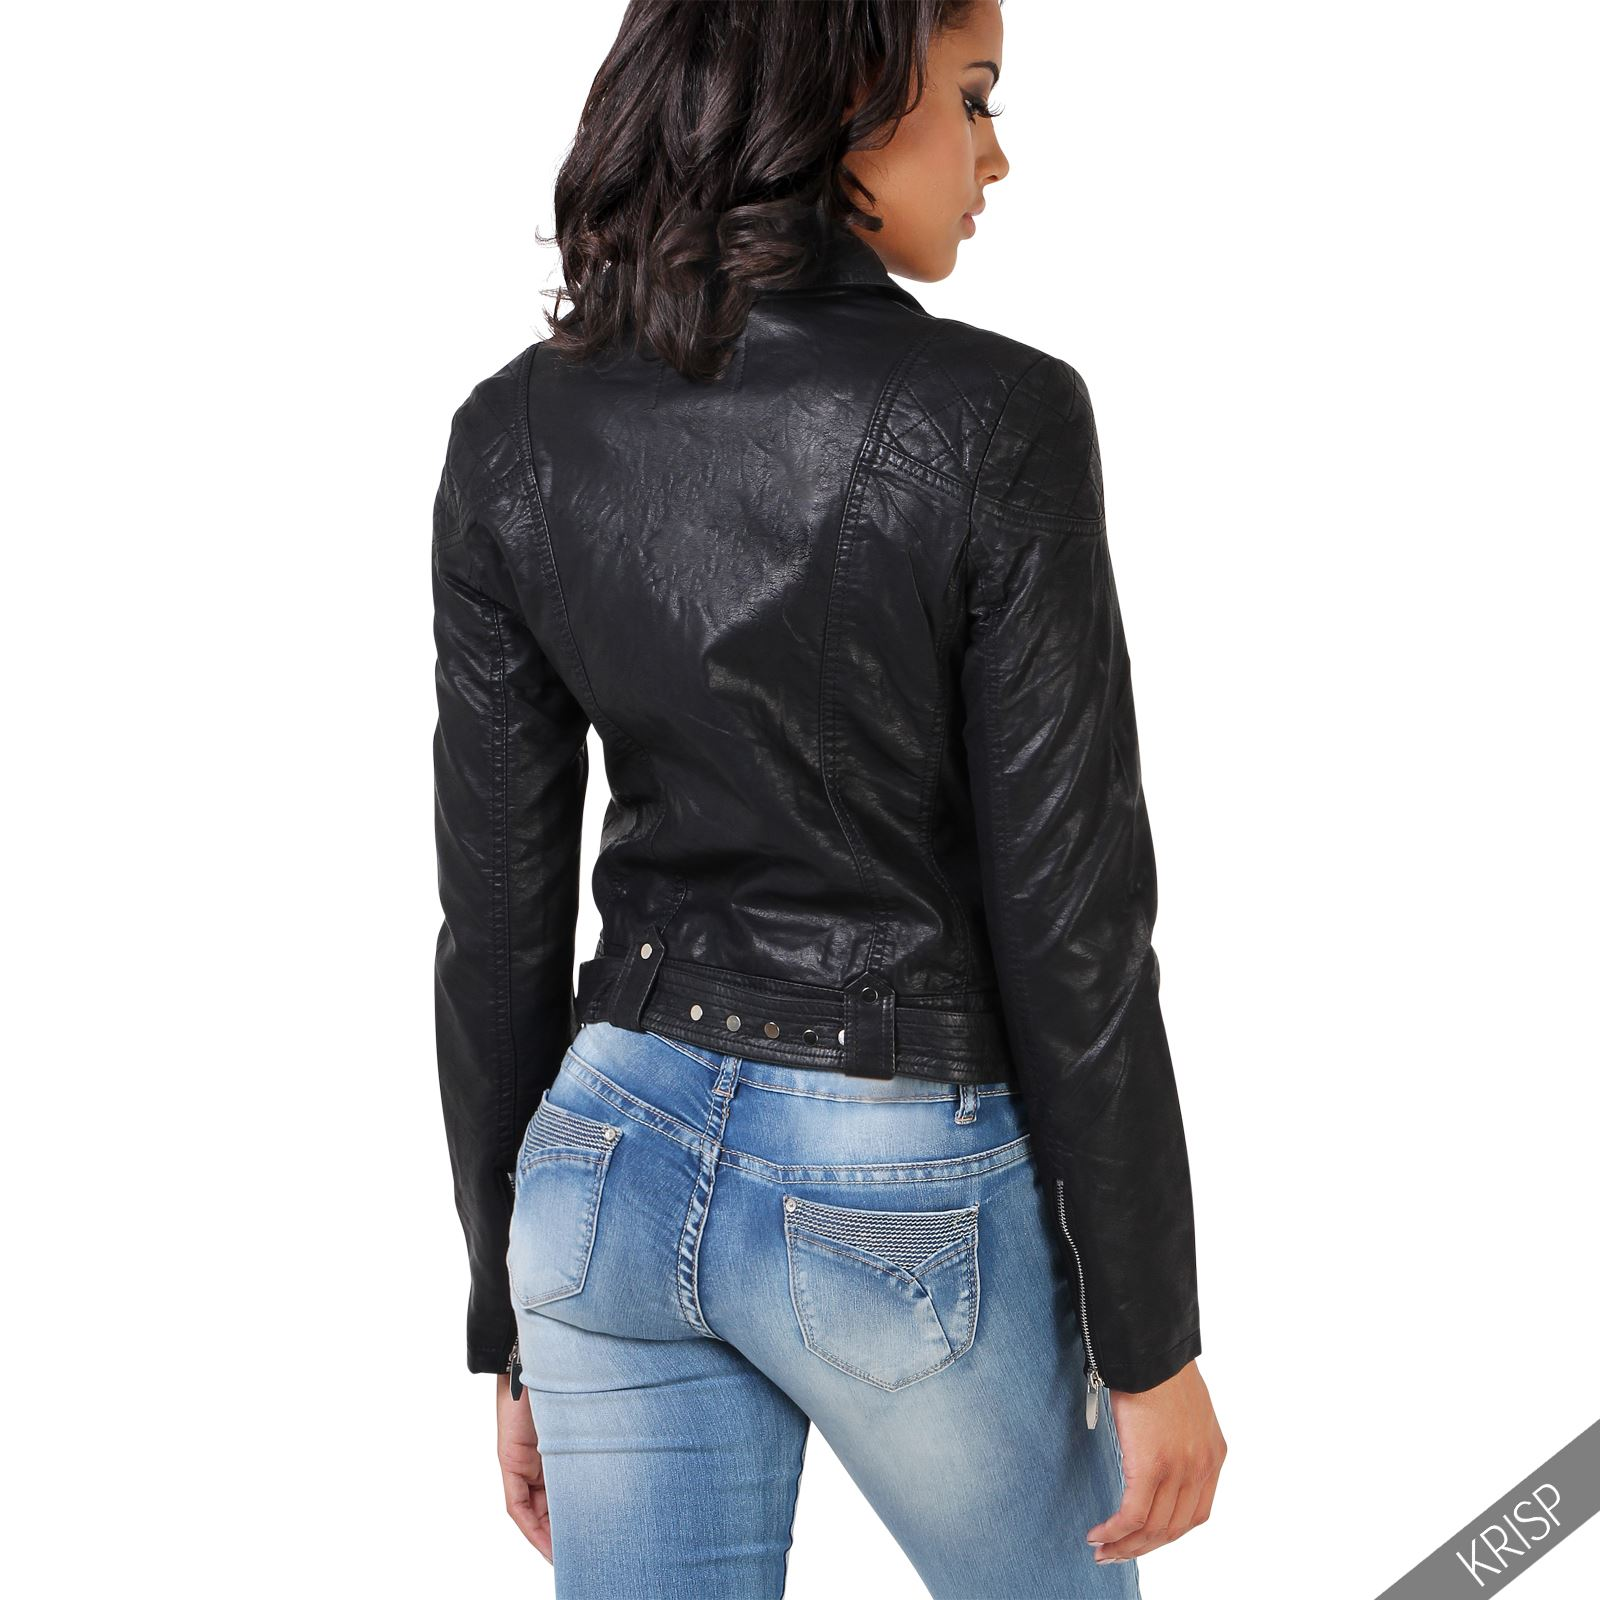 femmes veste biker casual matelass e clous sexy cuir cintr e moto blouson motard ebay. Black Bedroom Furniture Sets. Home Design Ideas